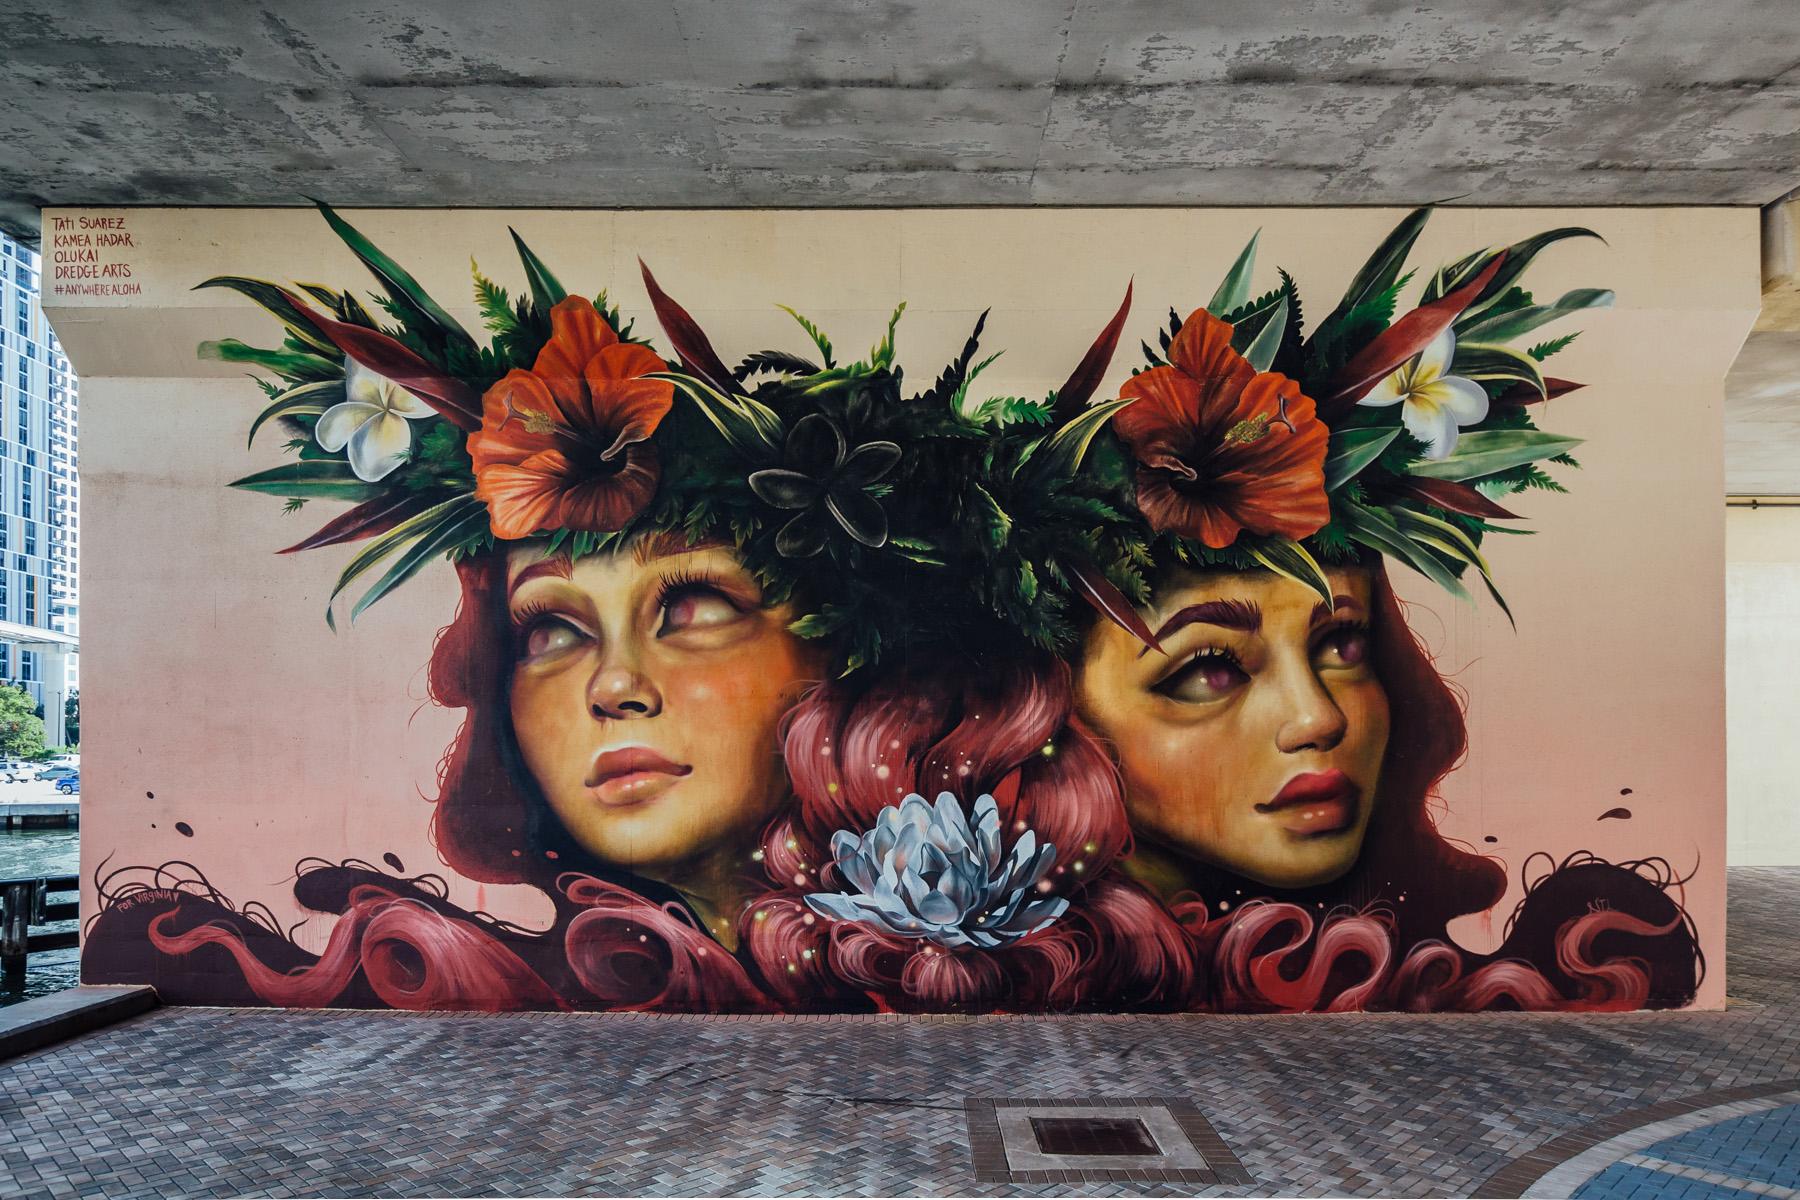 Tatiana Suarez & Kamea Hadar   curated by INOPERAbLE for   D  redge Arts  , Miami, FL    Thank you Olukai and Miami River Commission. Photo by  Diana Larrea